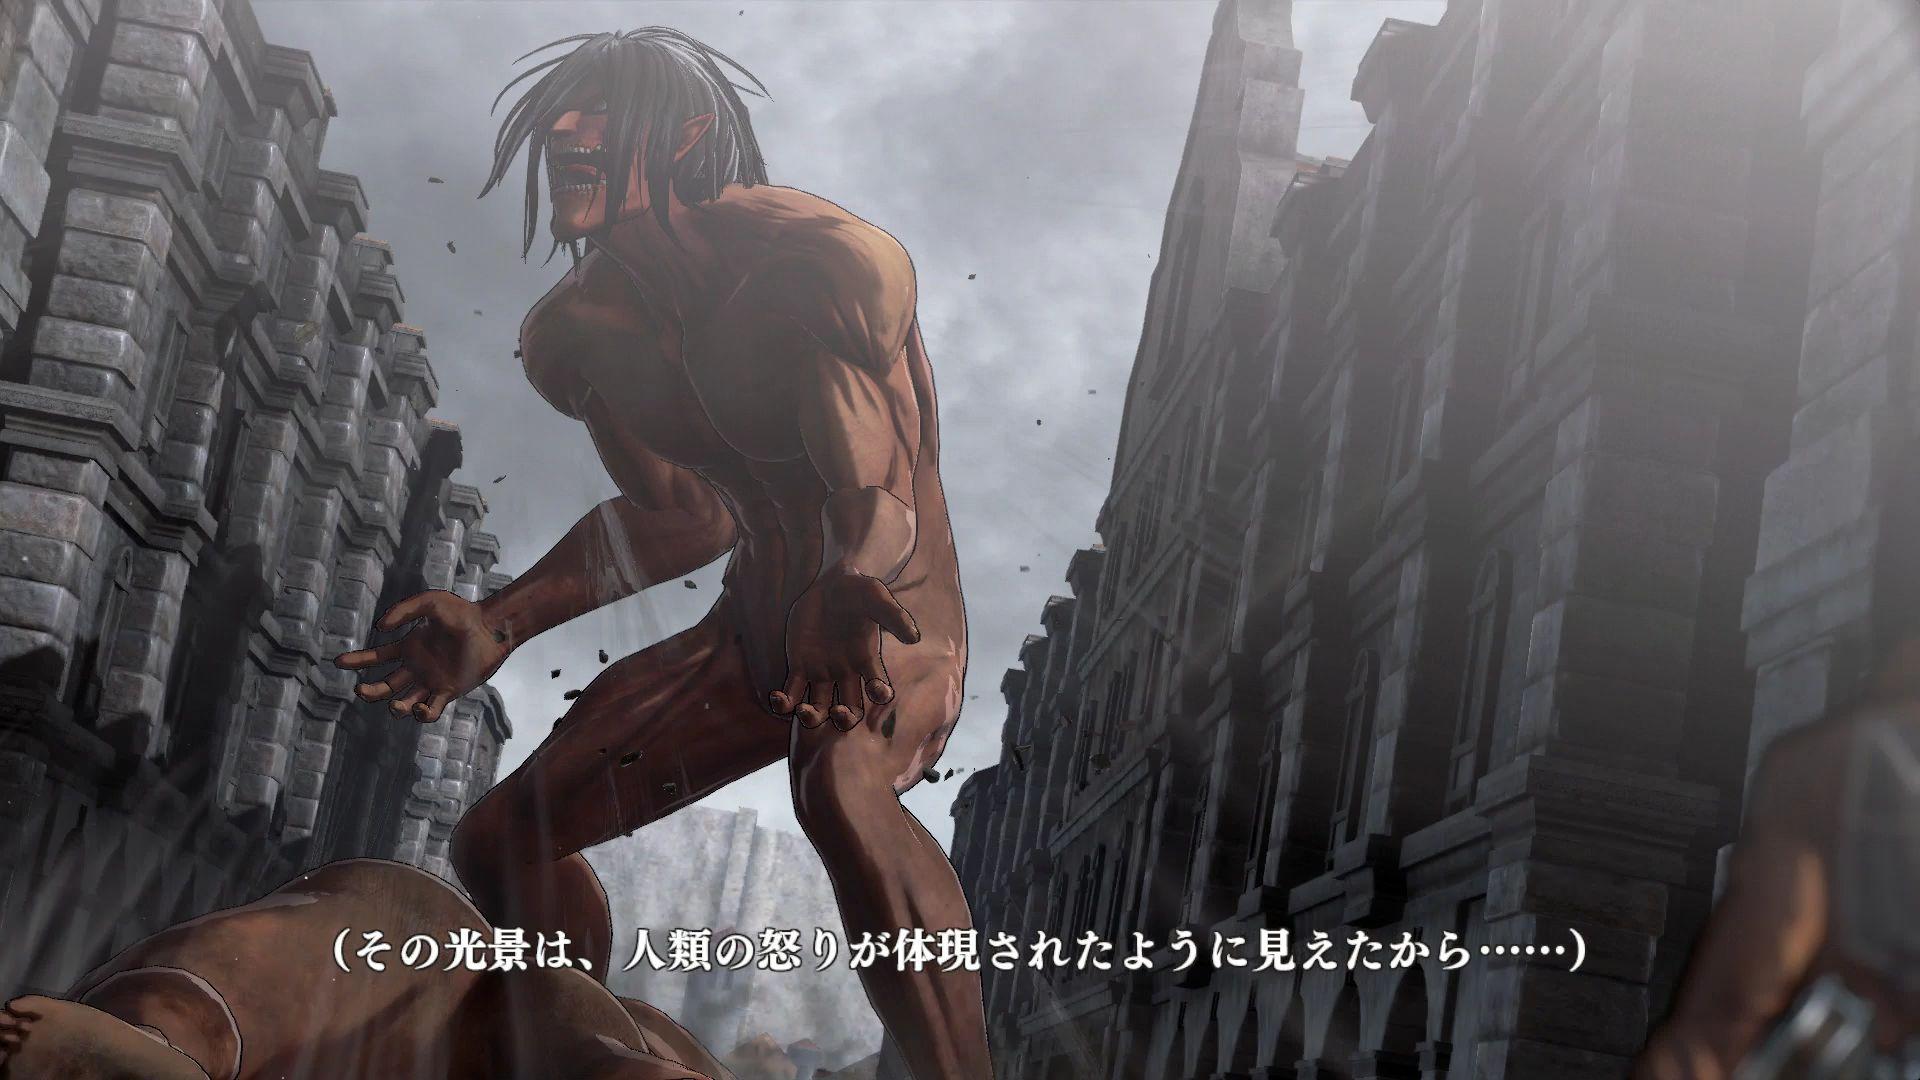 Attack-on-Titan-Screenshot-2016-02-18-11-09-07